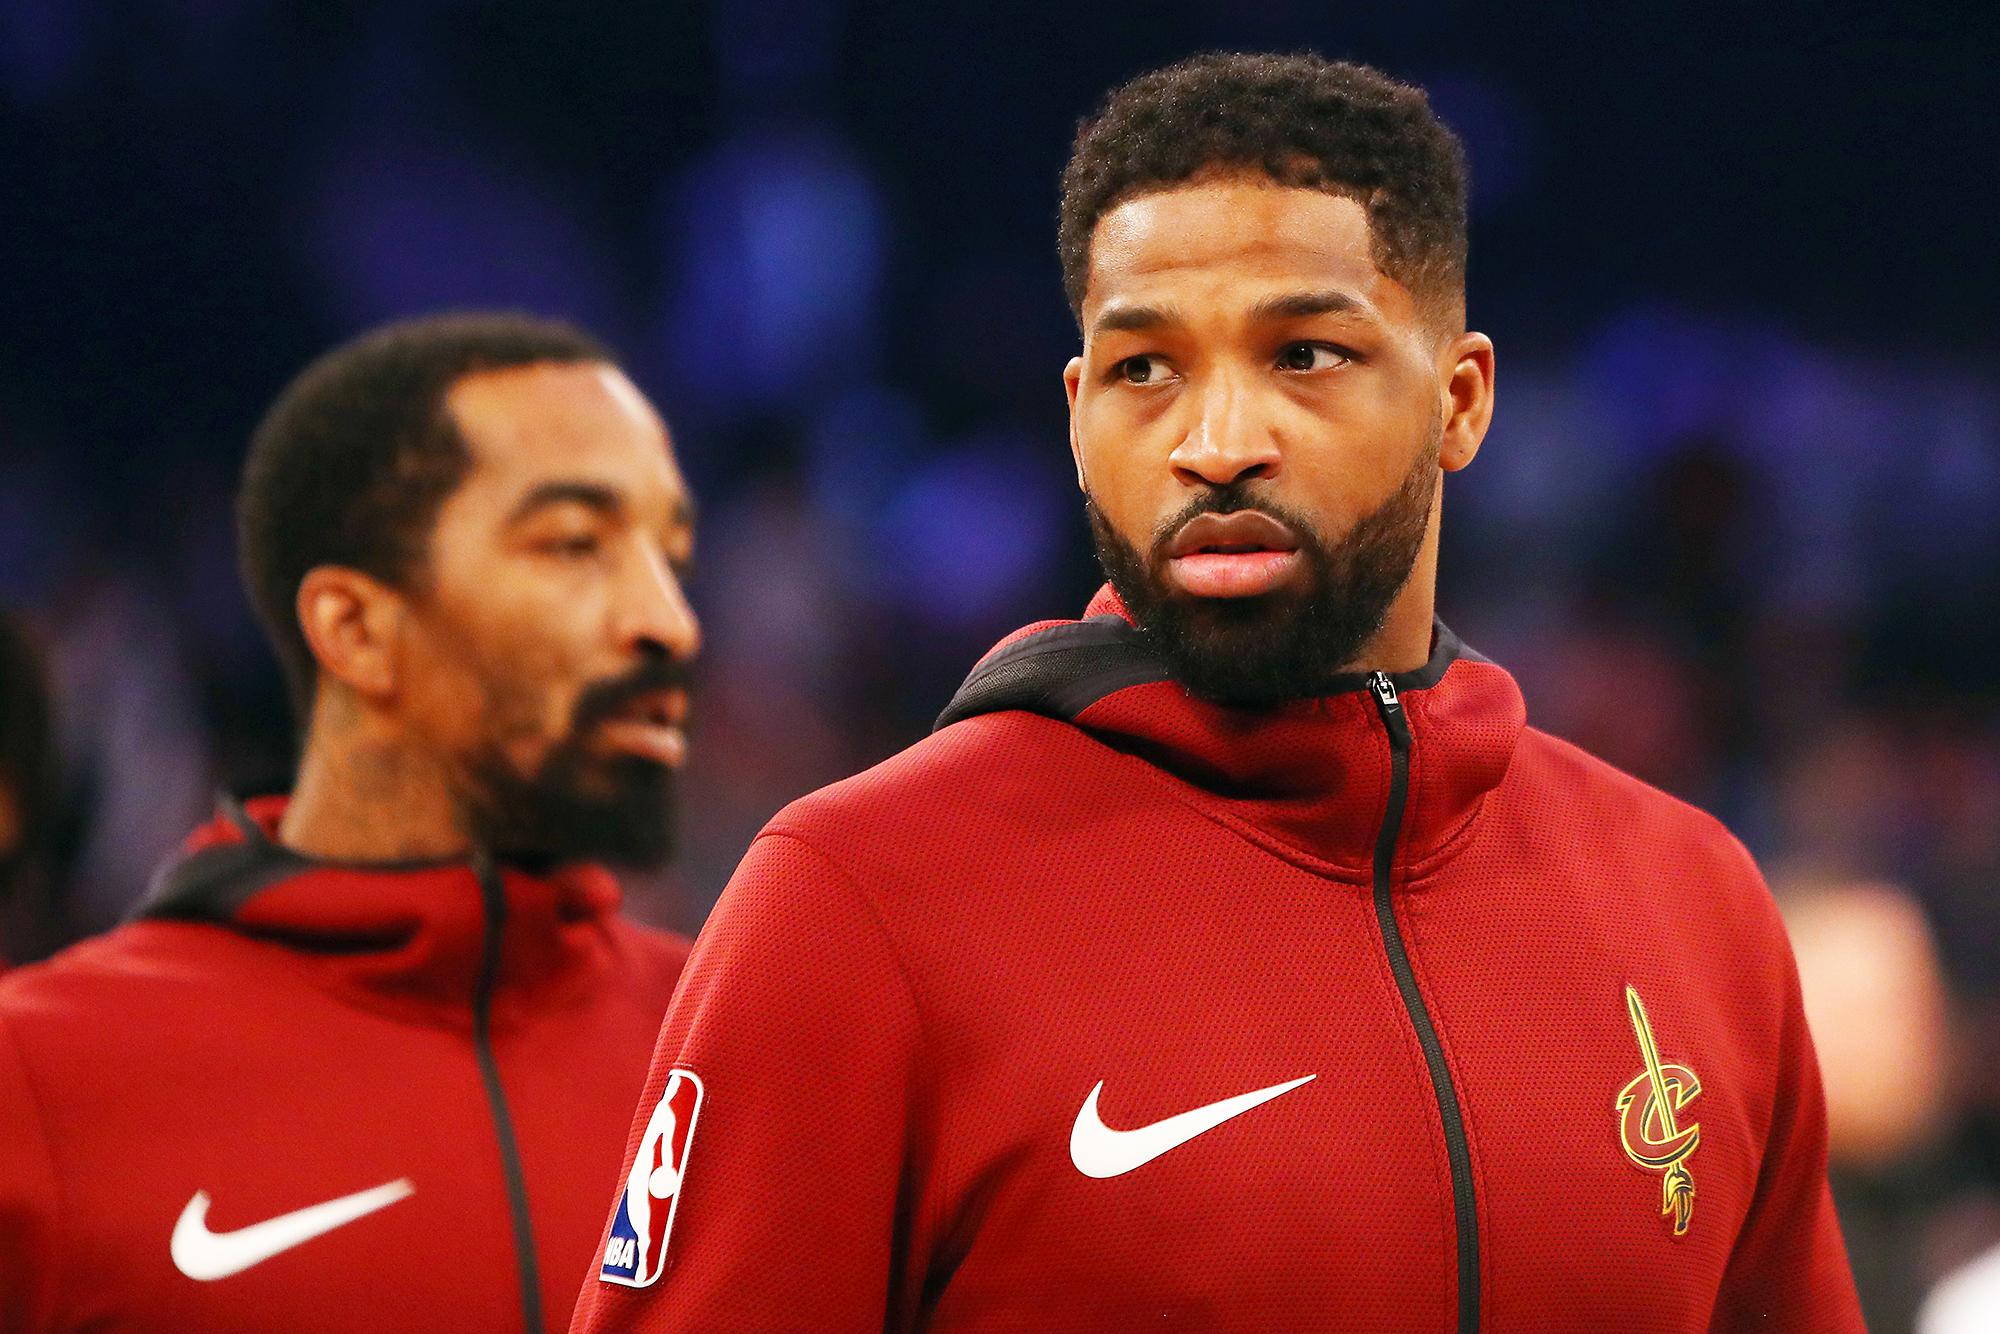 Tristan Thompson Cleveland Cavaliers